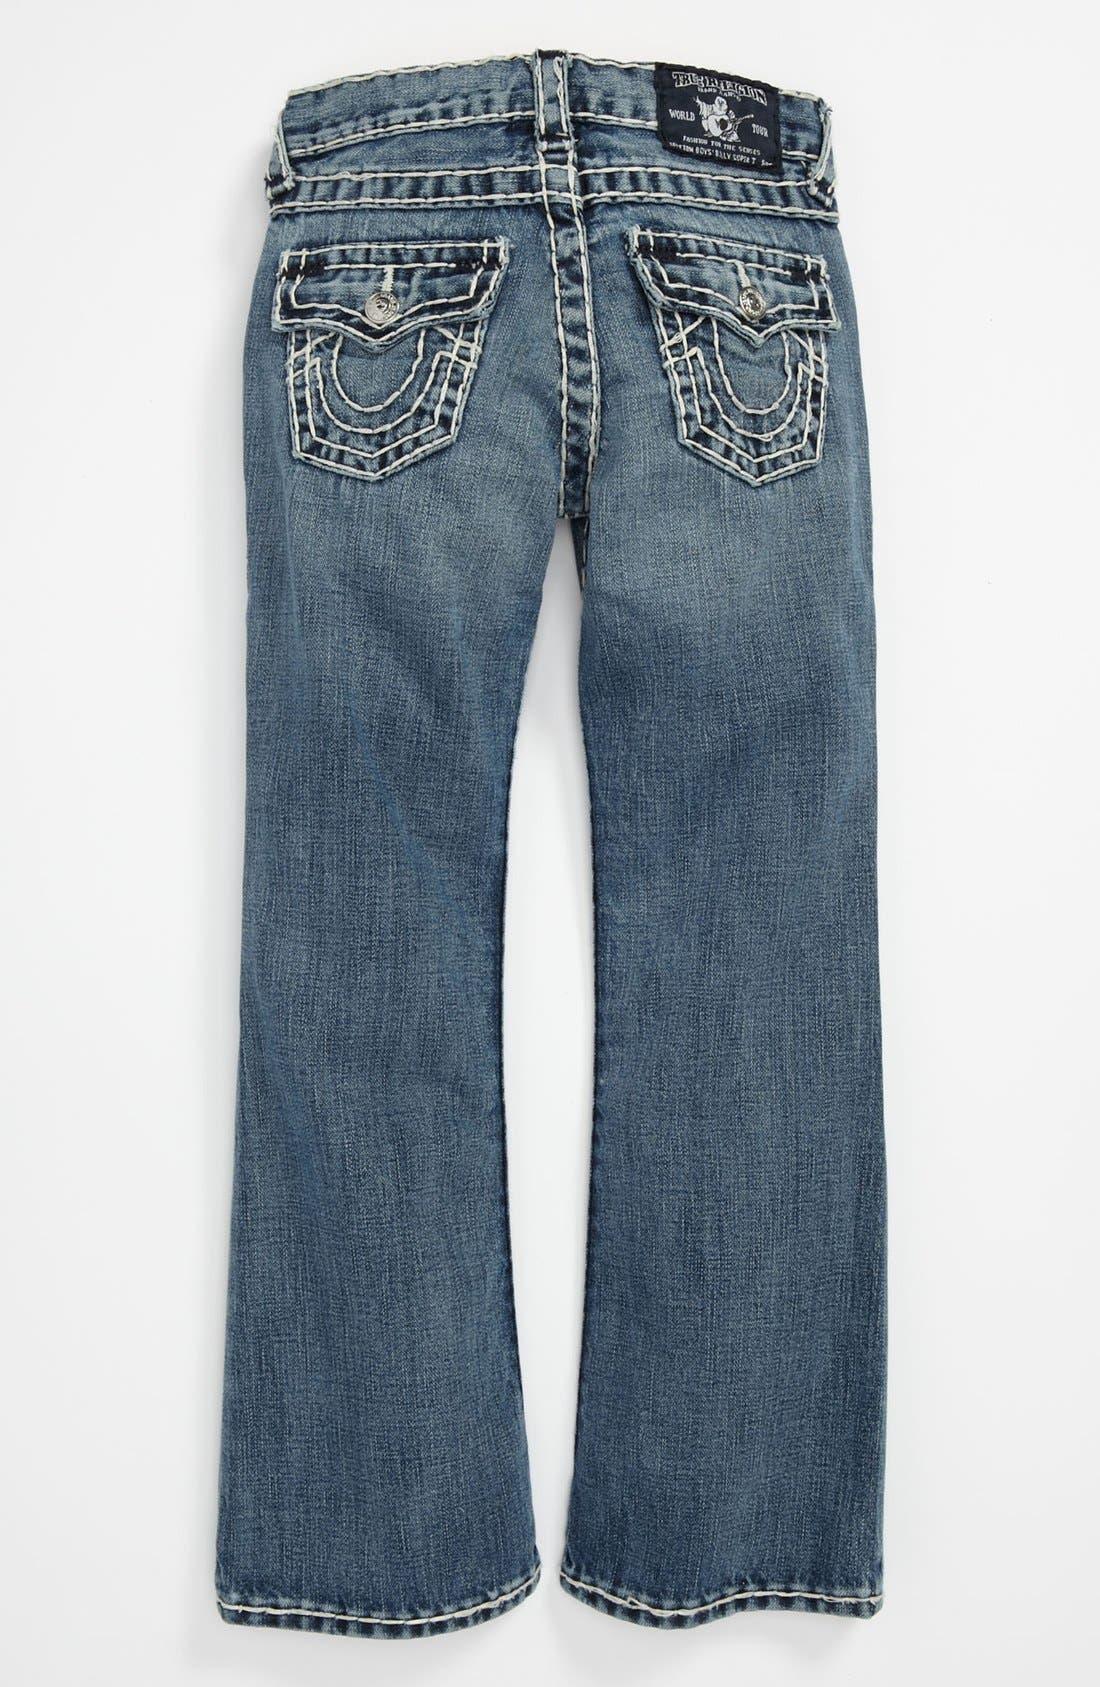 Main Image - True Religion Brand Jeans 'Billy Super T' Jeans (Little Boys)